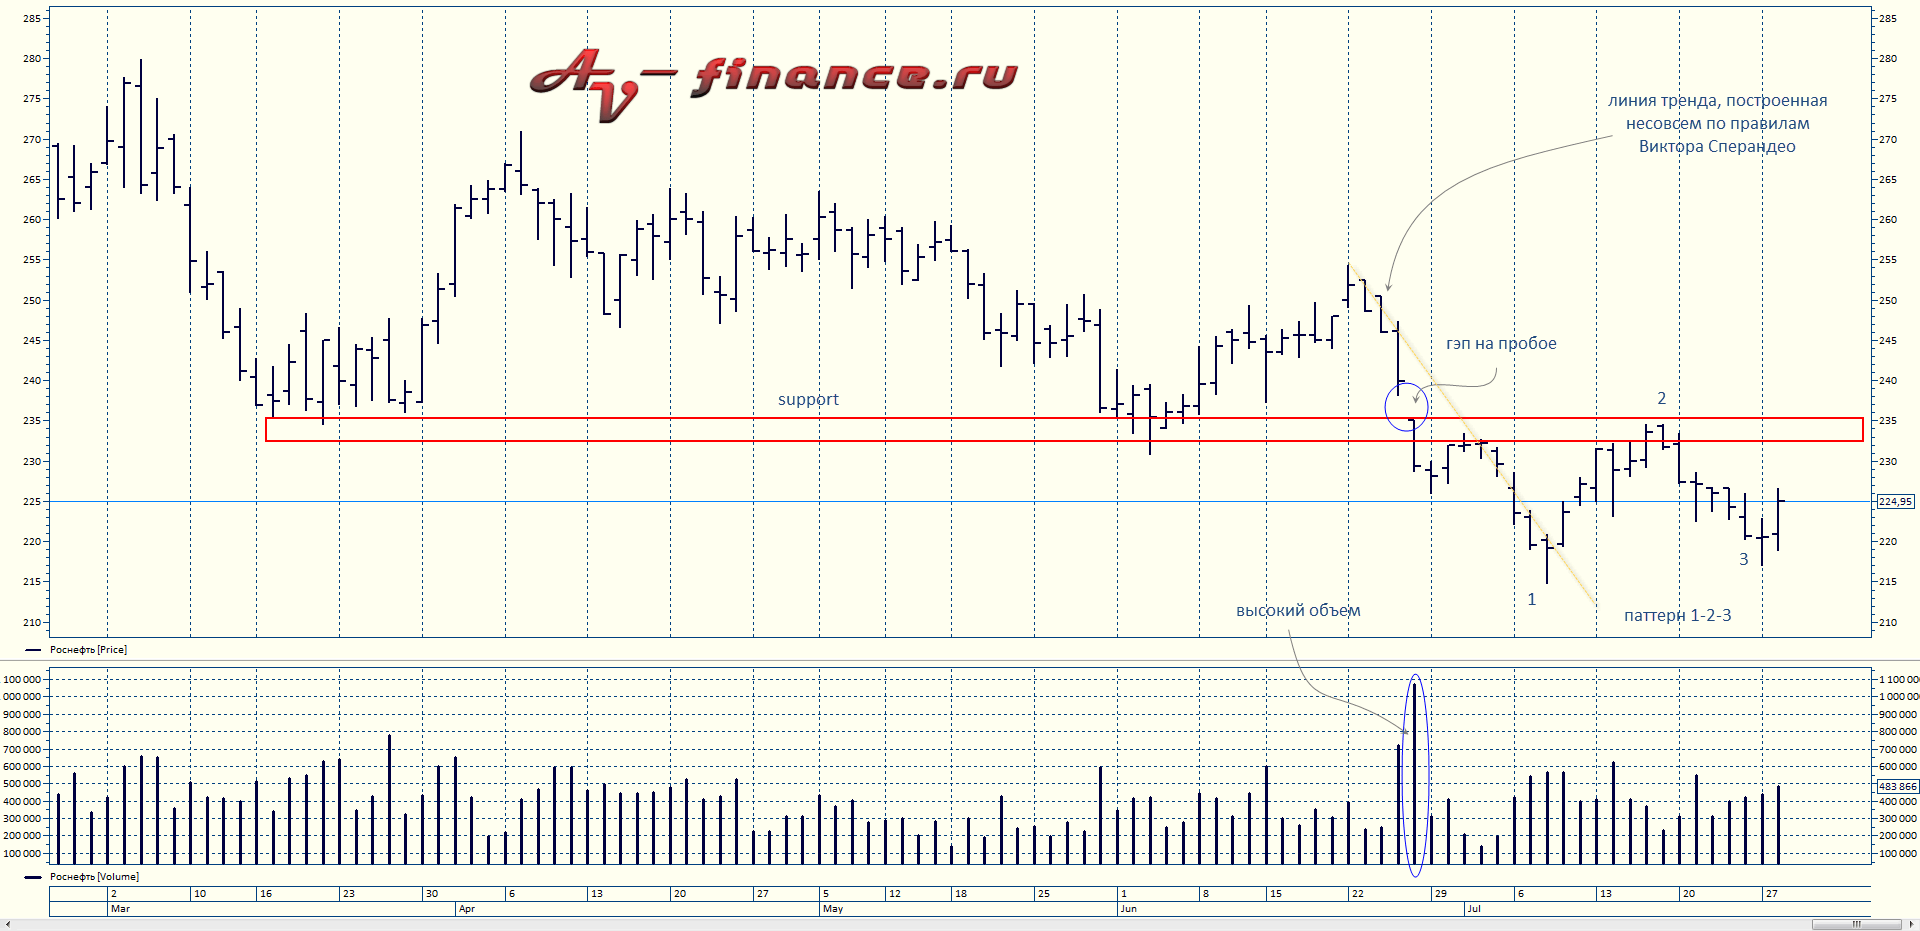 price-action-rosneft-3